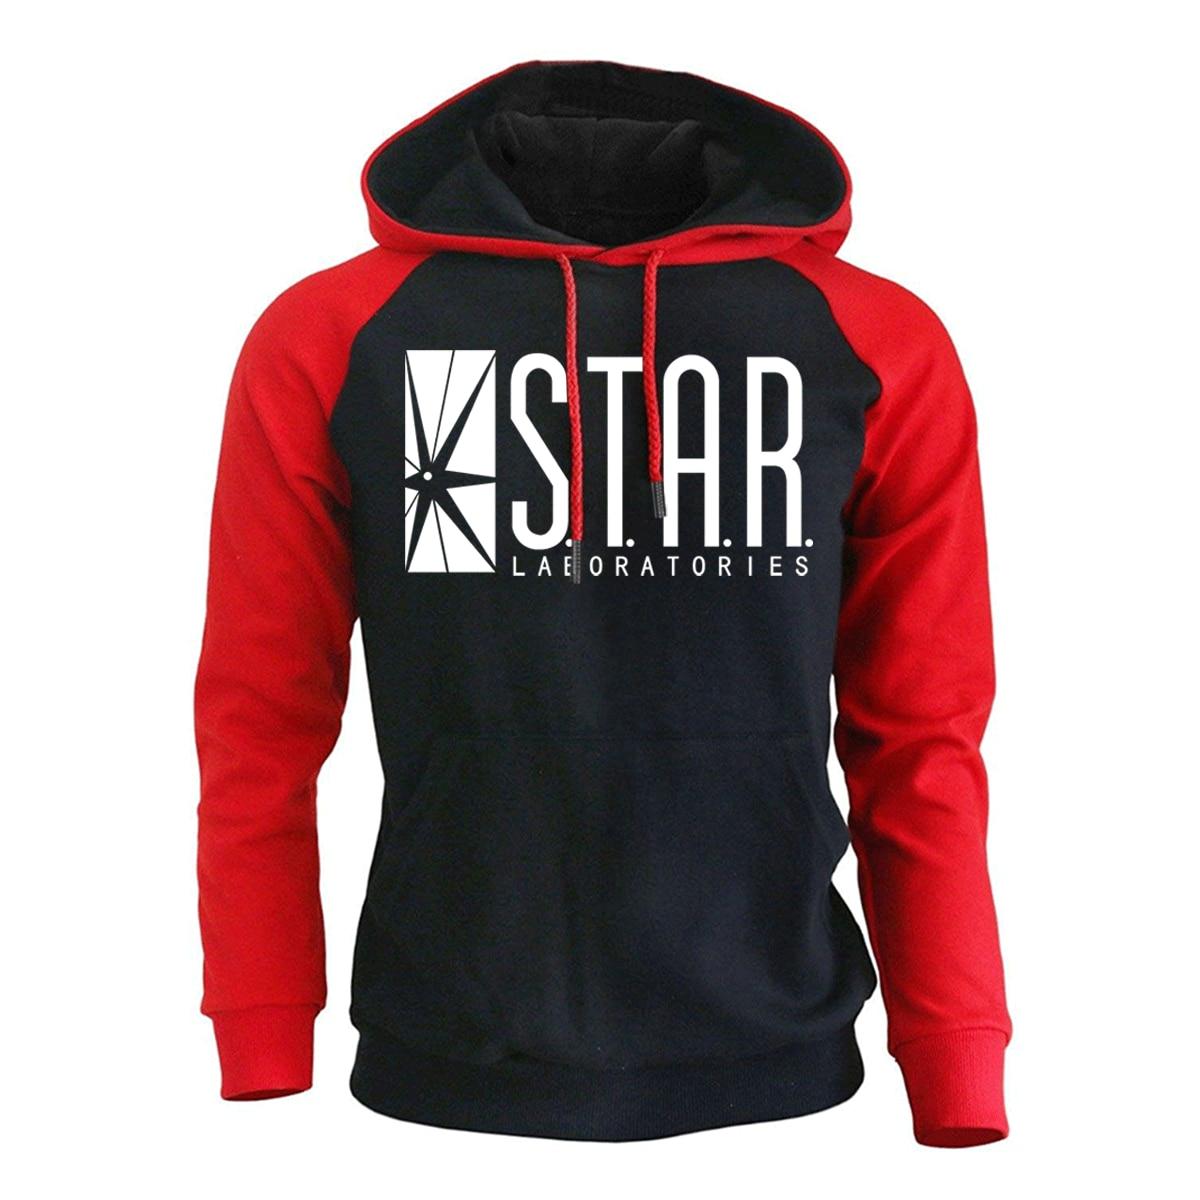 Star Laboratories Star Labs Sweatshirt For Women's or Men's